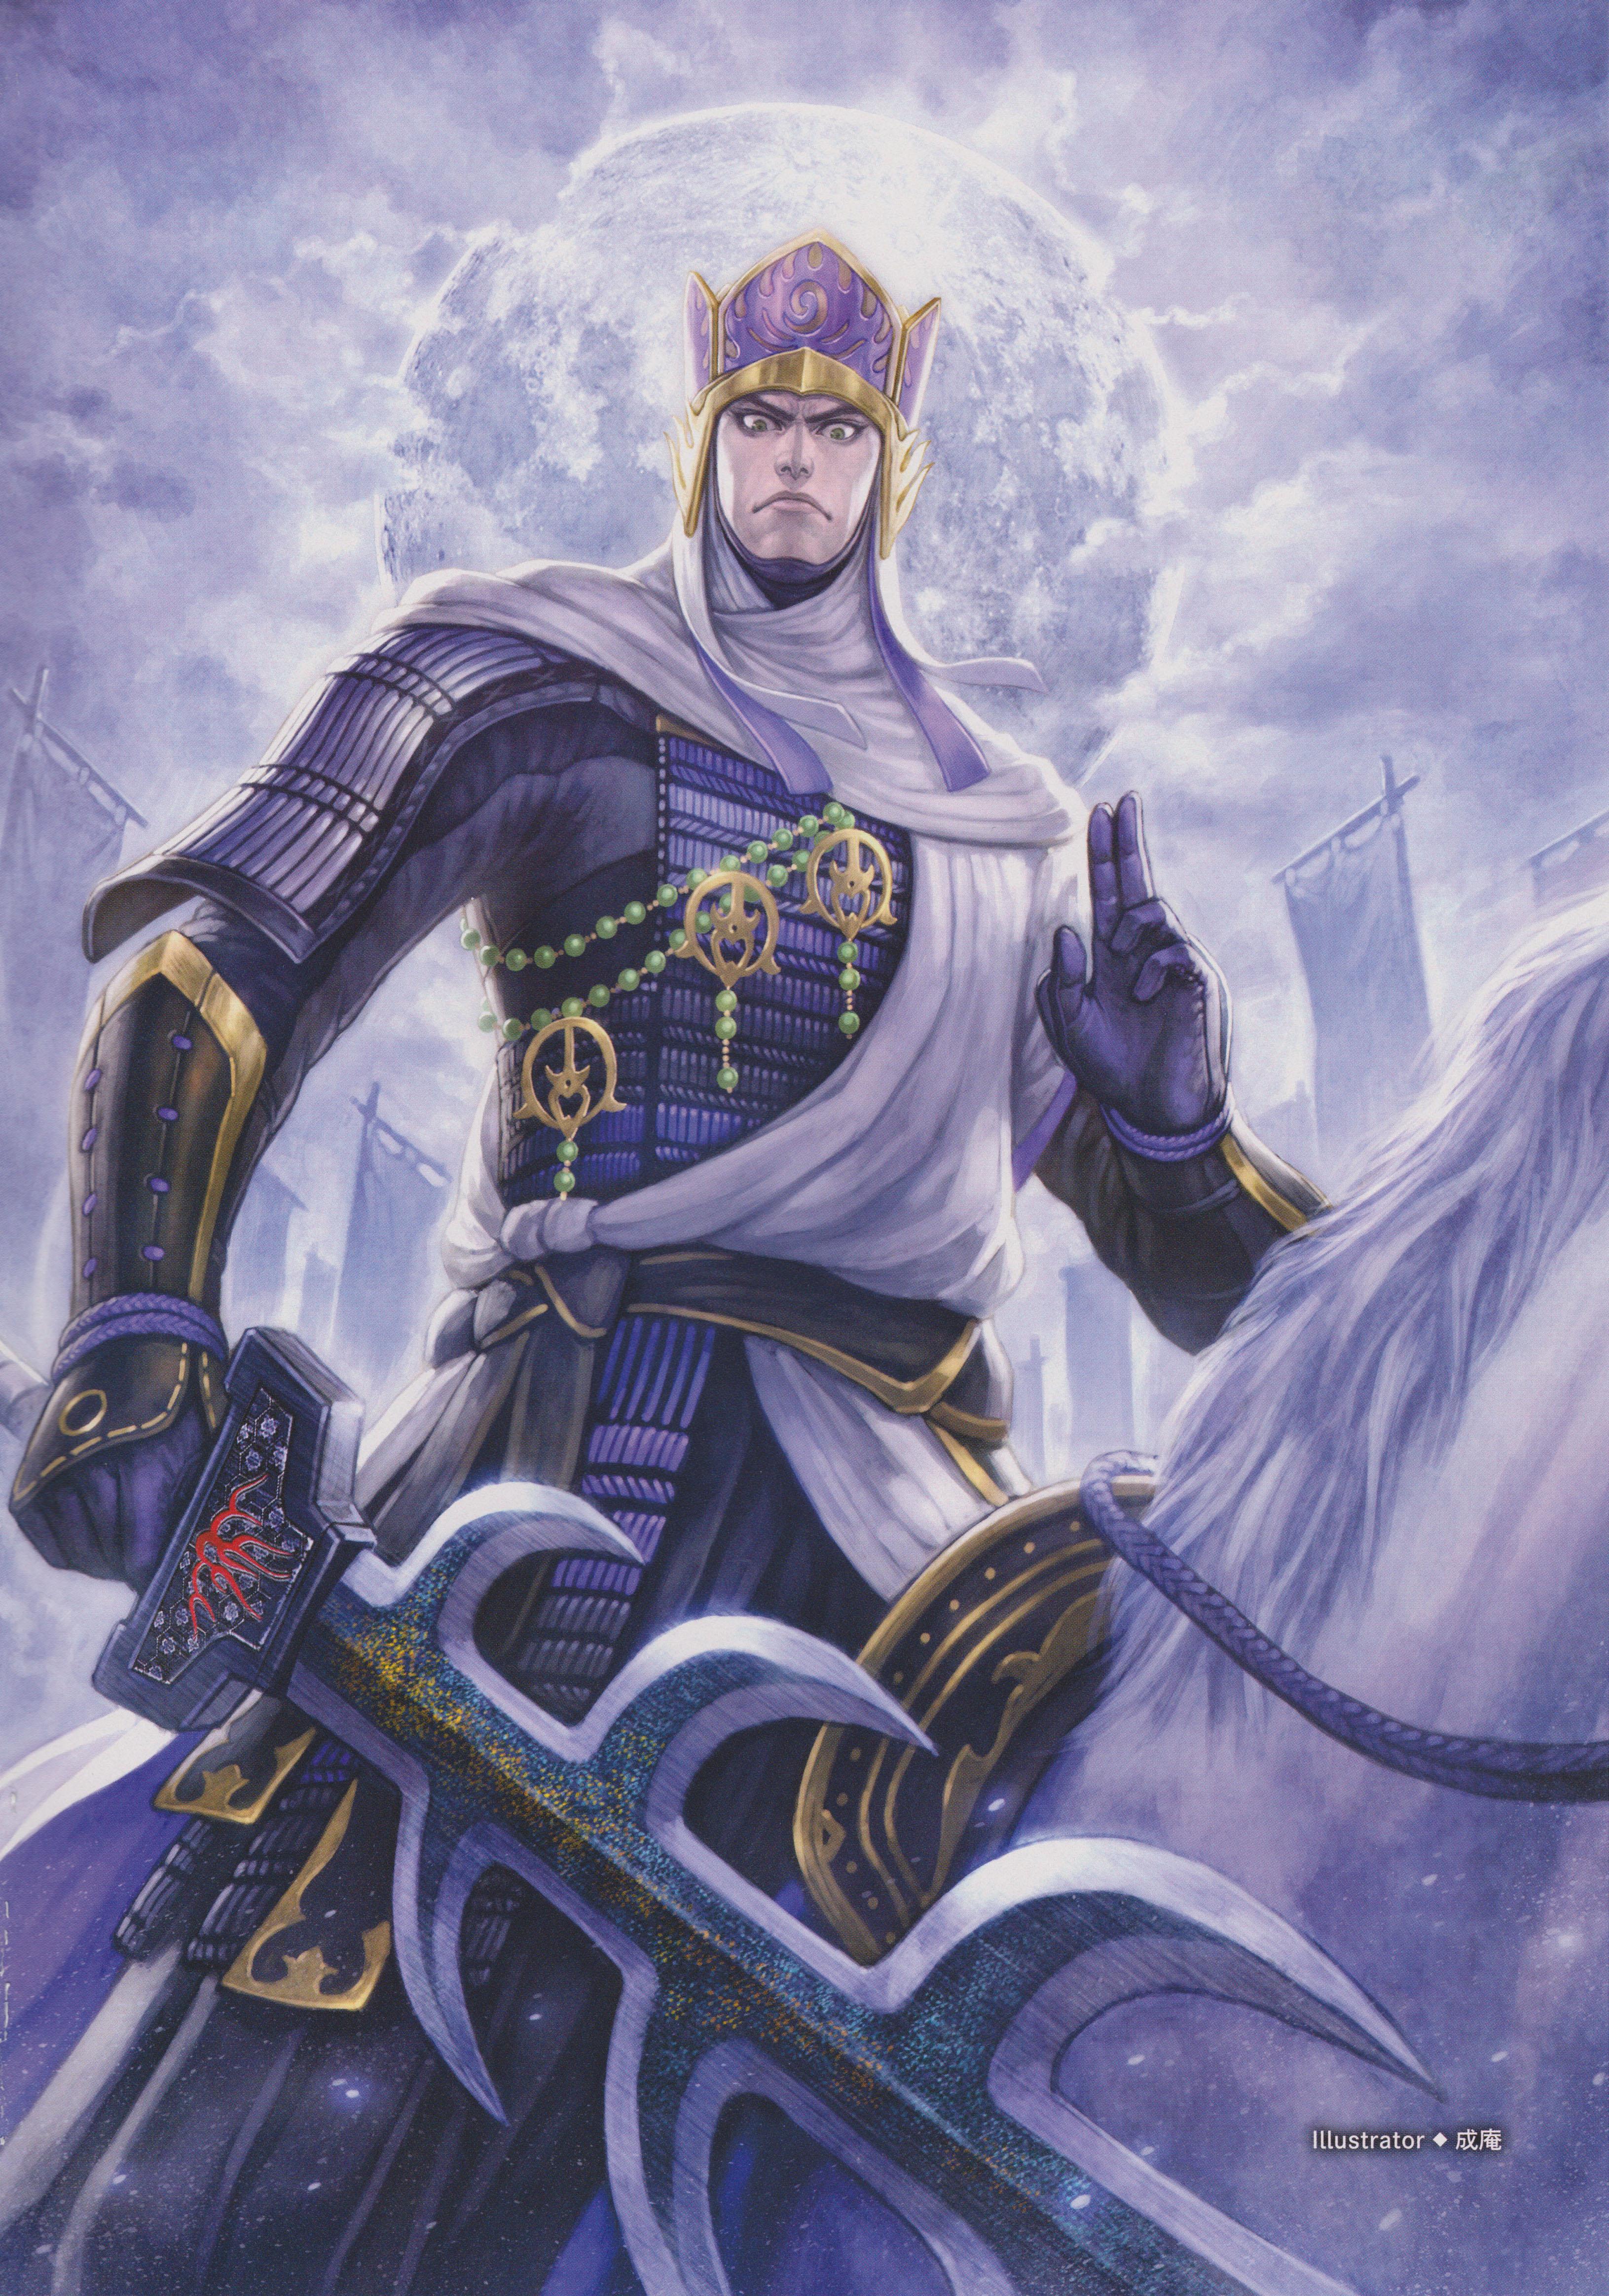 Uesugi Kenshin SW4 artwork